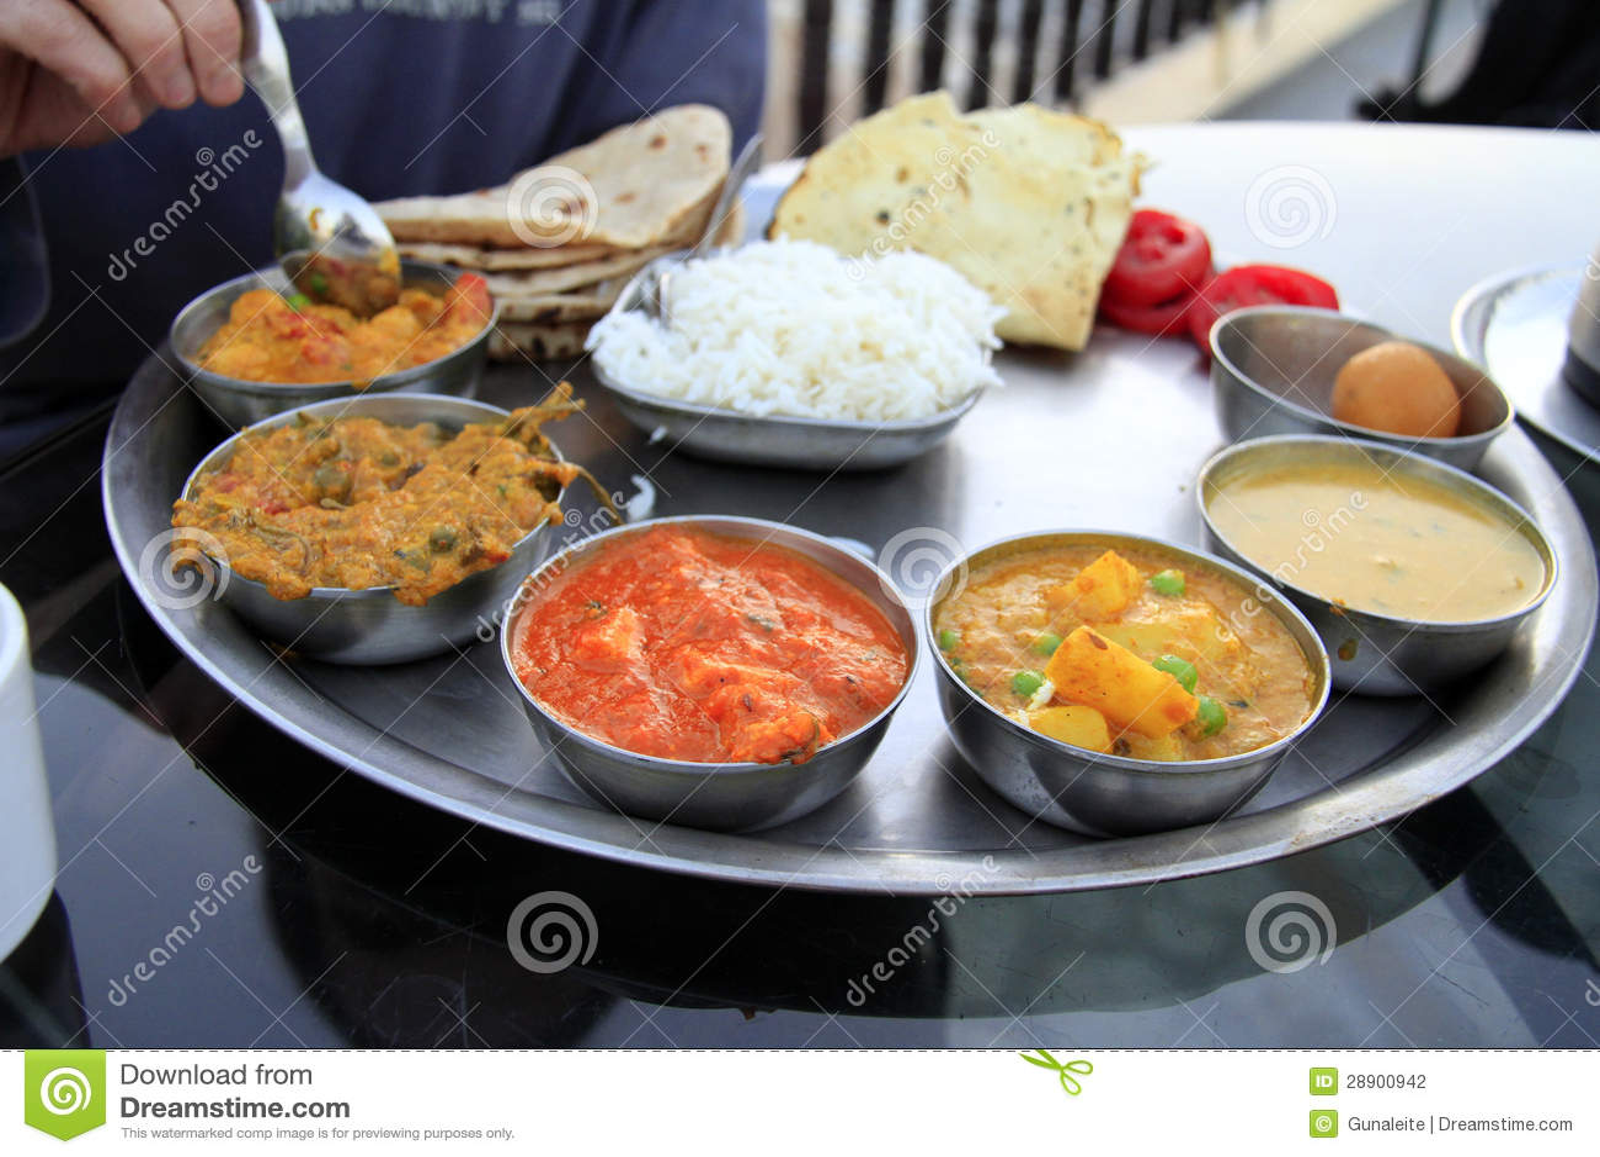 repas indien traditionnel thali photographie stock image 28900942. Black Bedroom Furniture Sets. Home Design Ideas